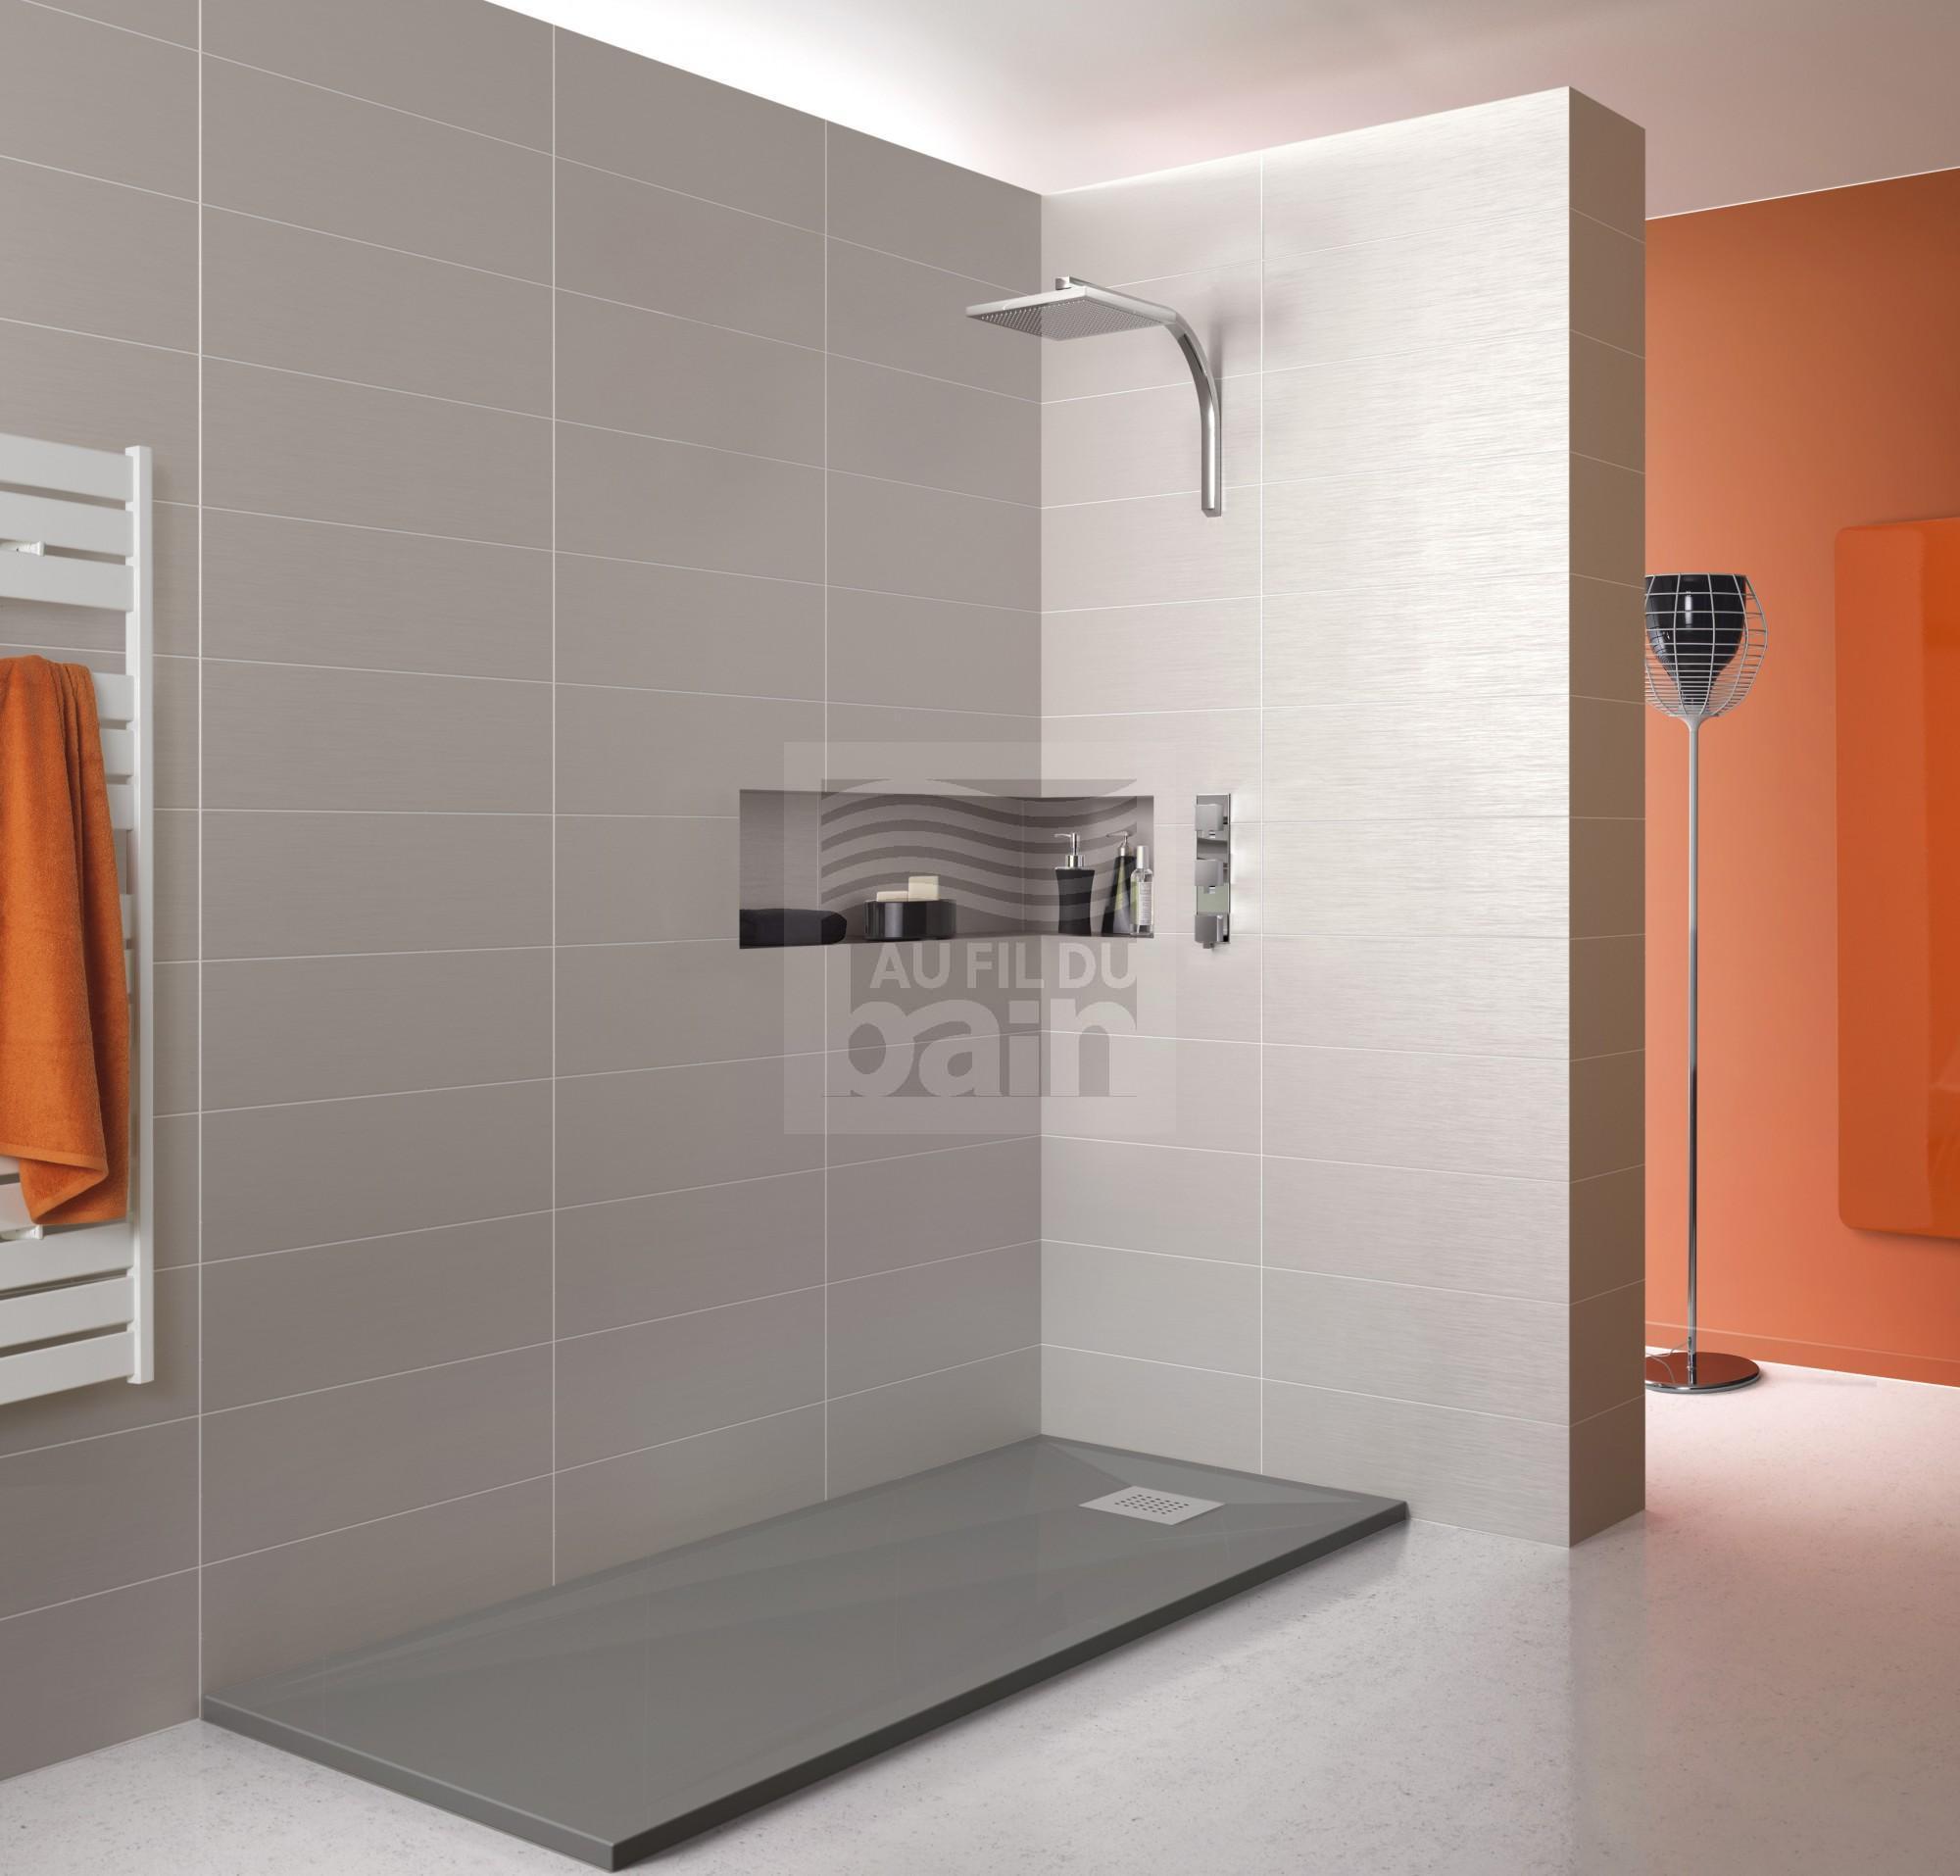 comment installer un receveur de douche extra plat. Black Bedroom Furniture Sets. Home Design Ideas